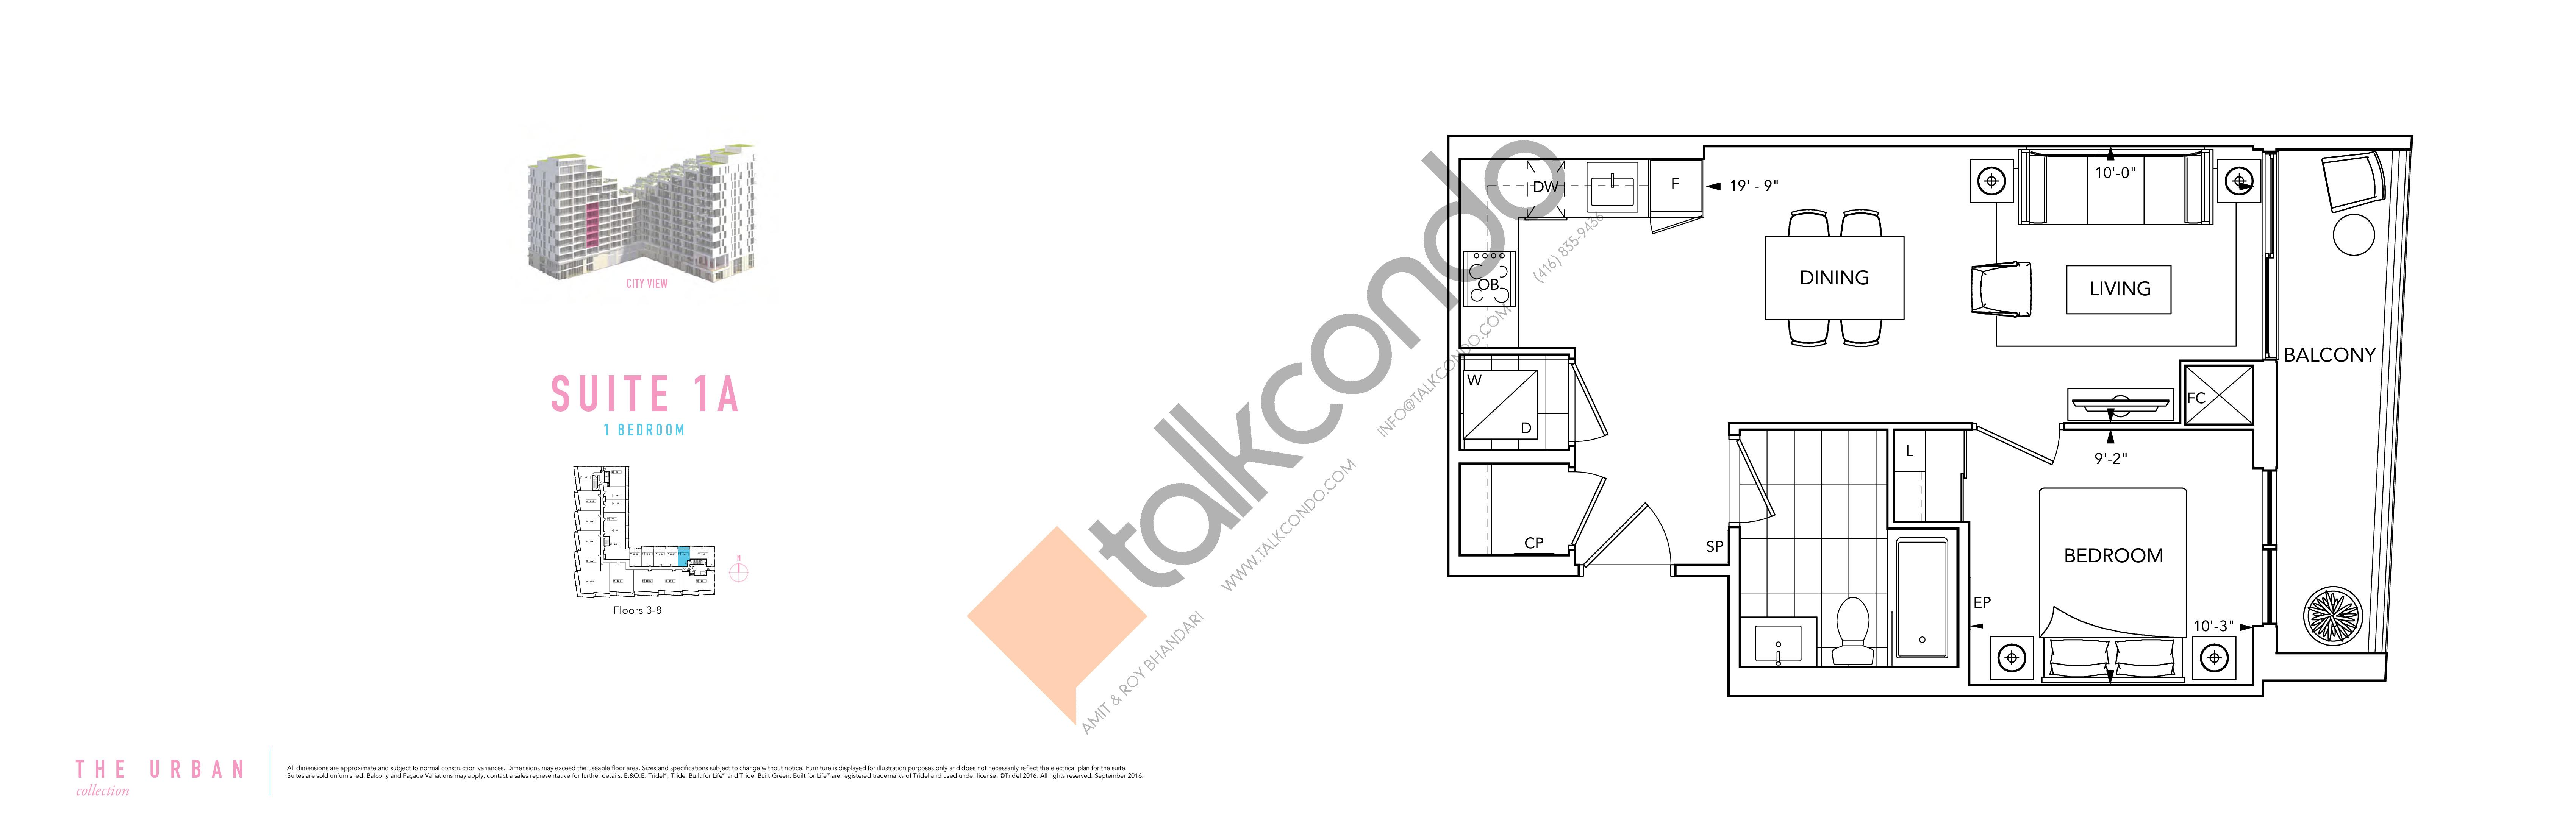 Suite 1A Floor Plan at Aquabella Condos - 562 sq.ft